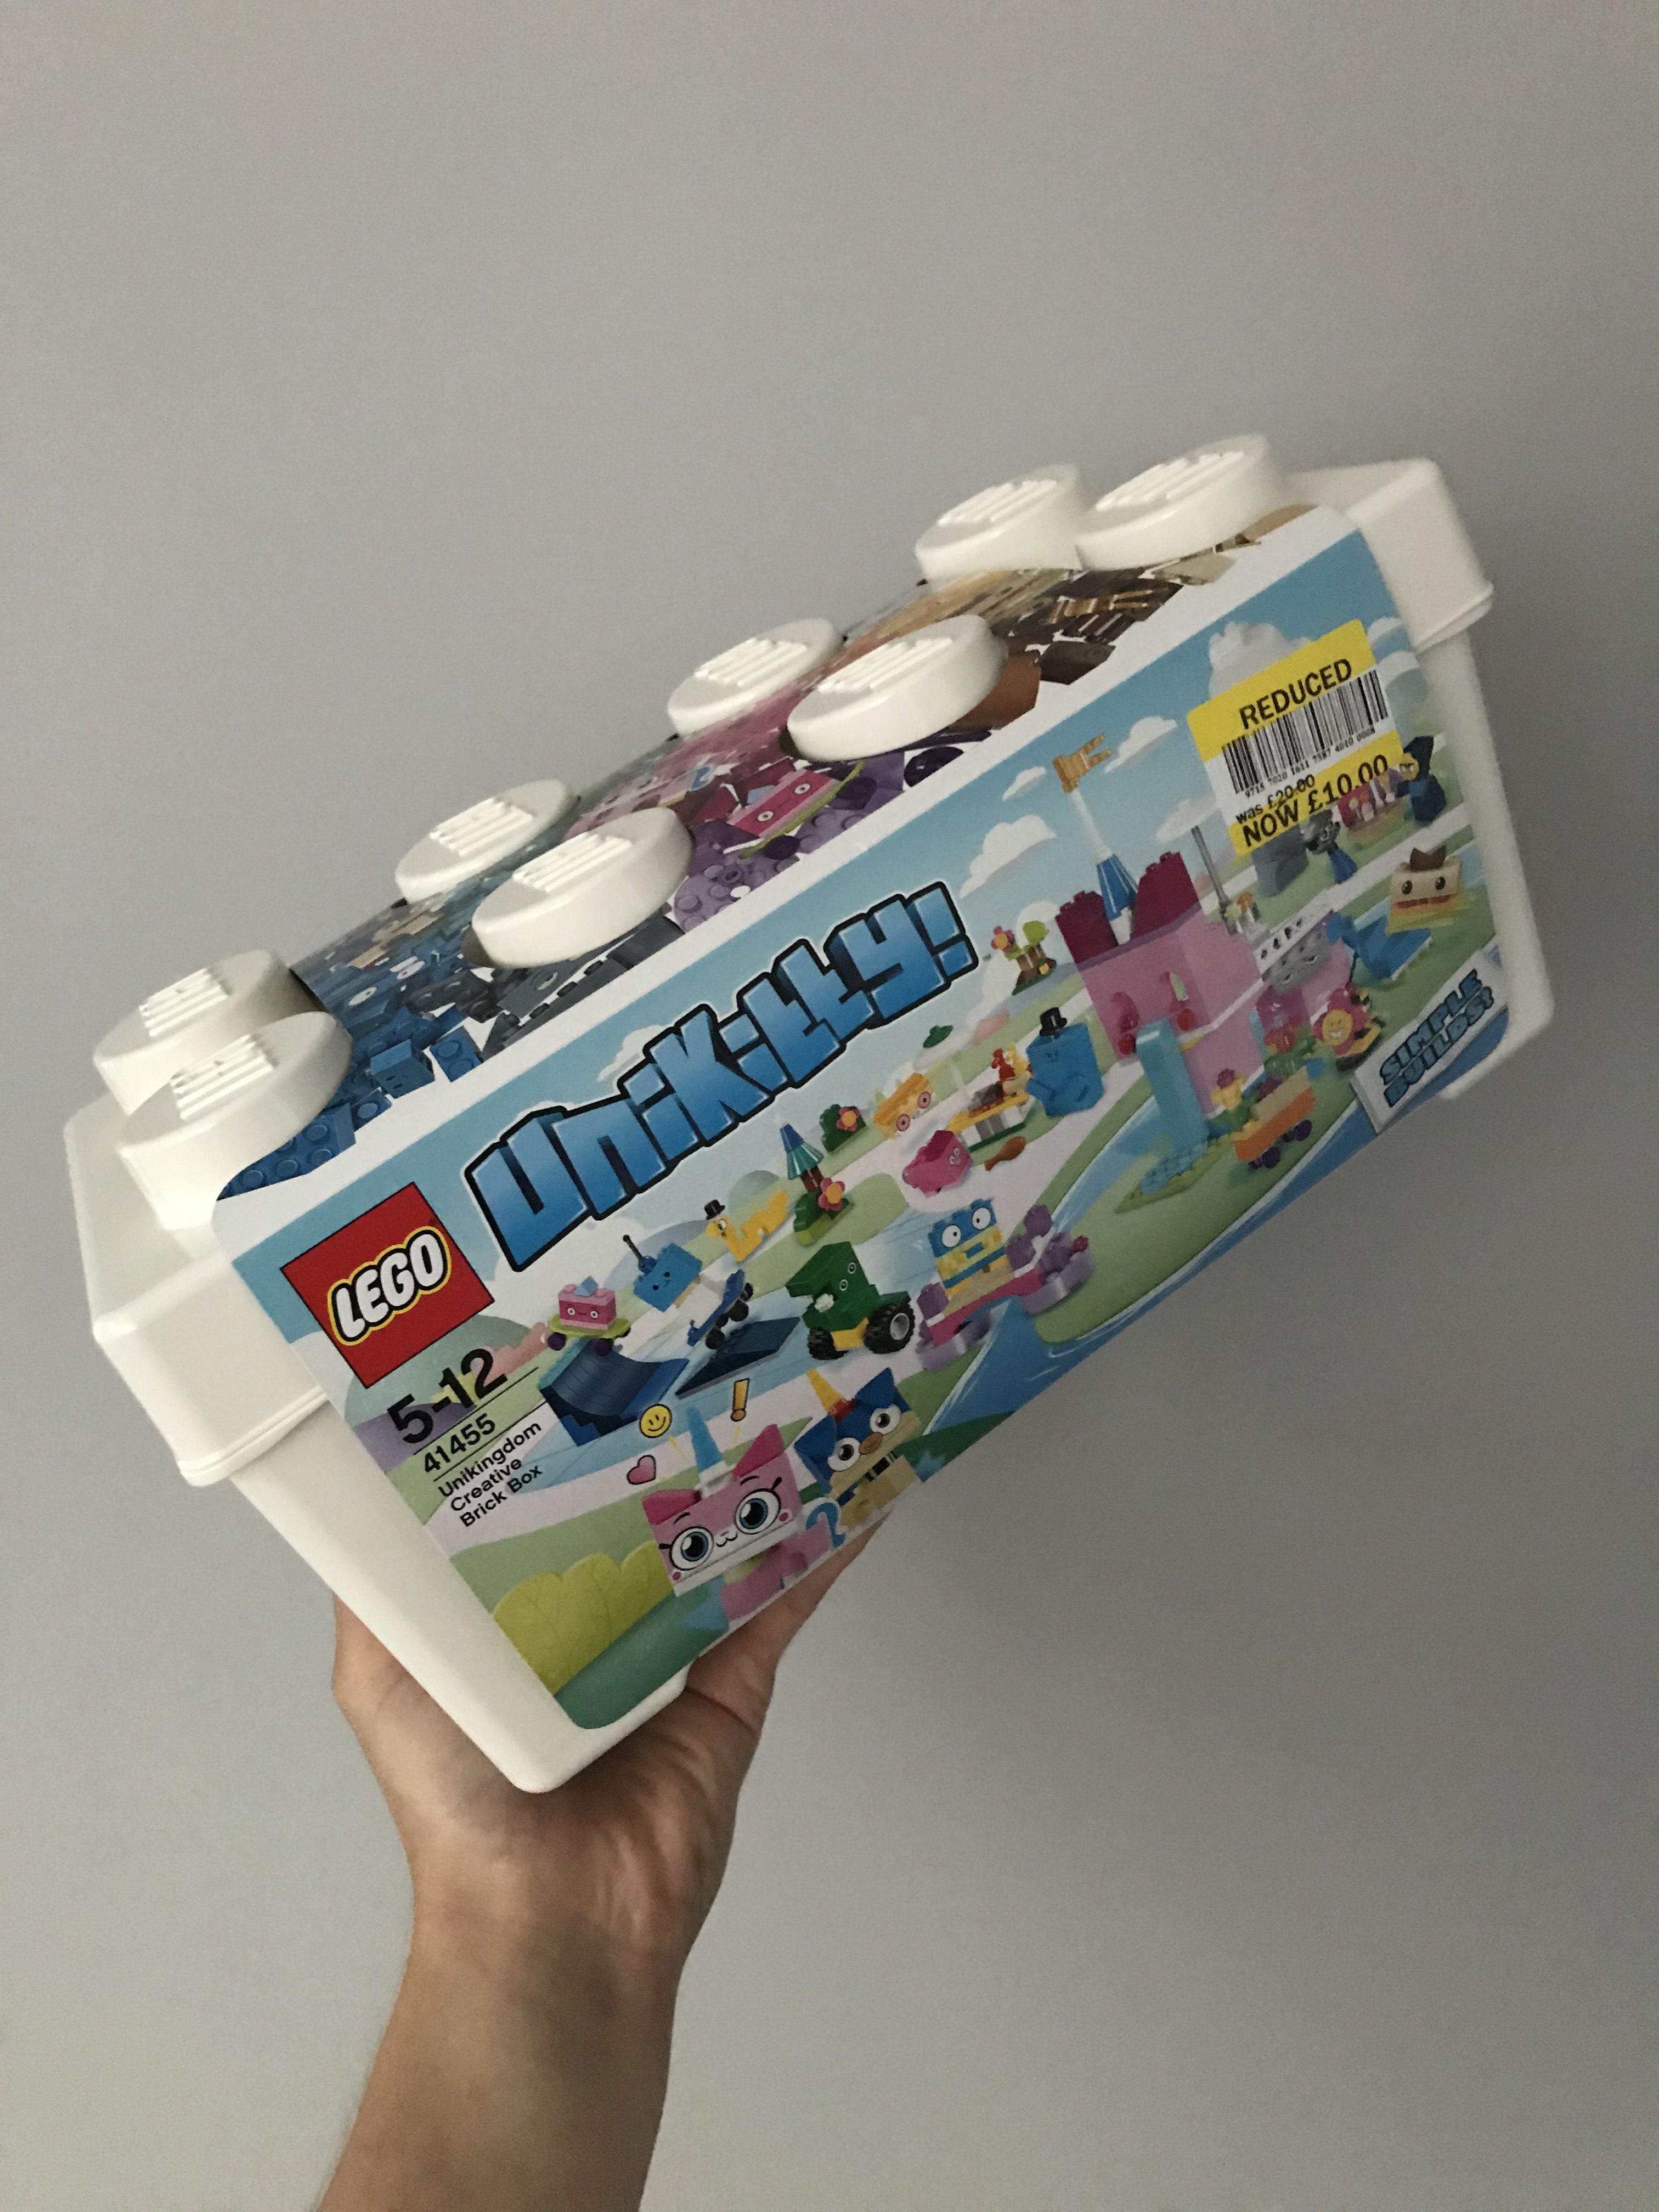 UniKitty Lego uniKingdom box - £10 instore @ Tesco (Shepton Mallet)